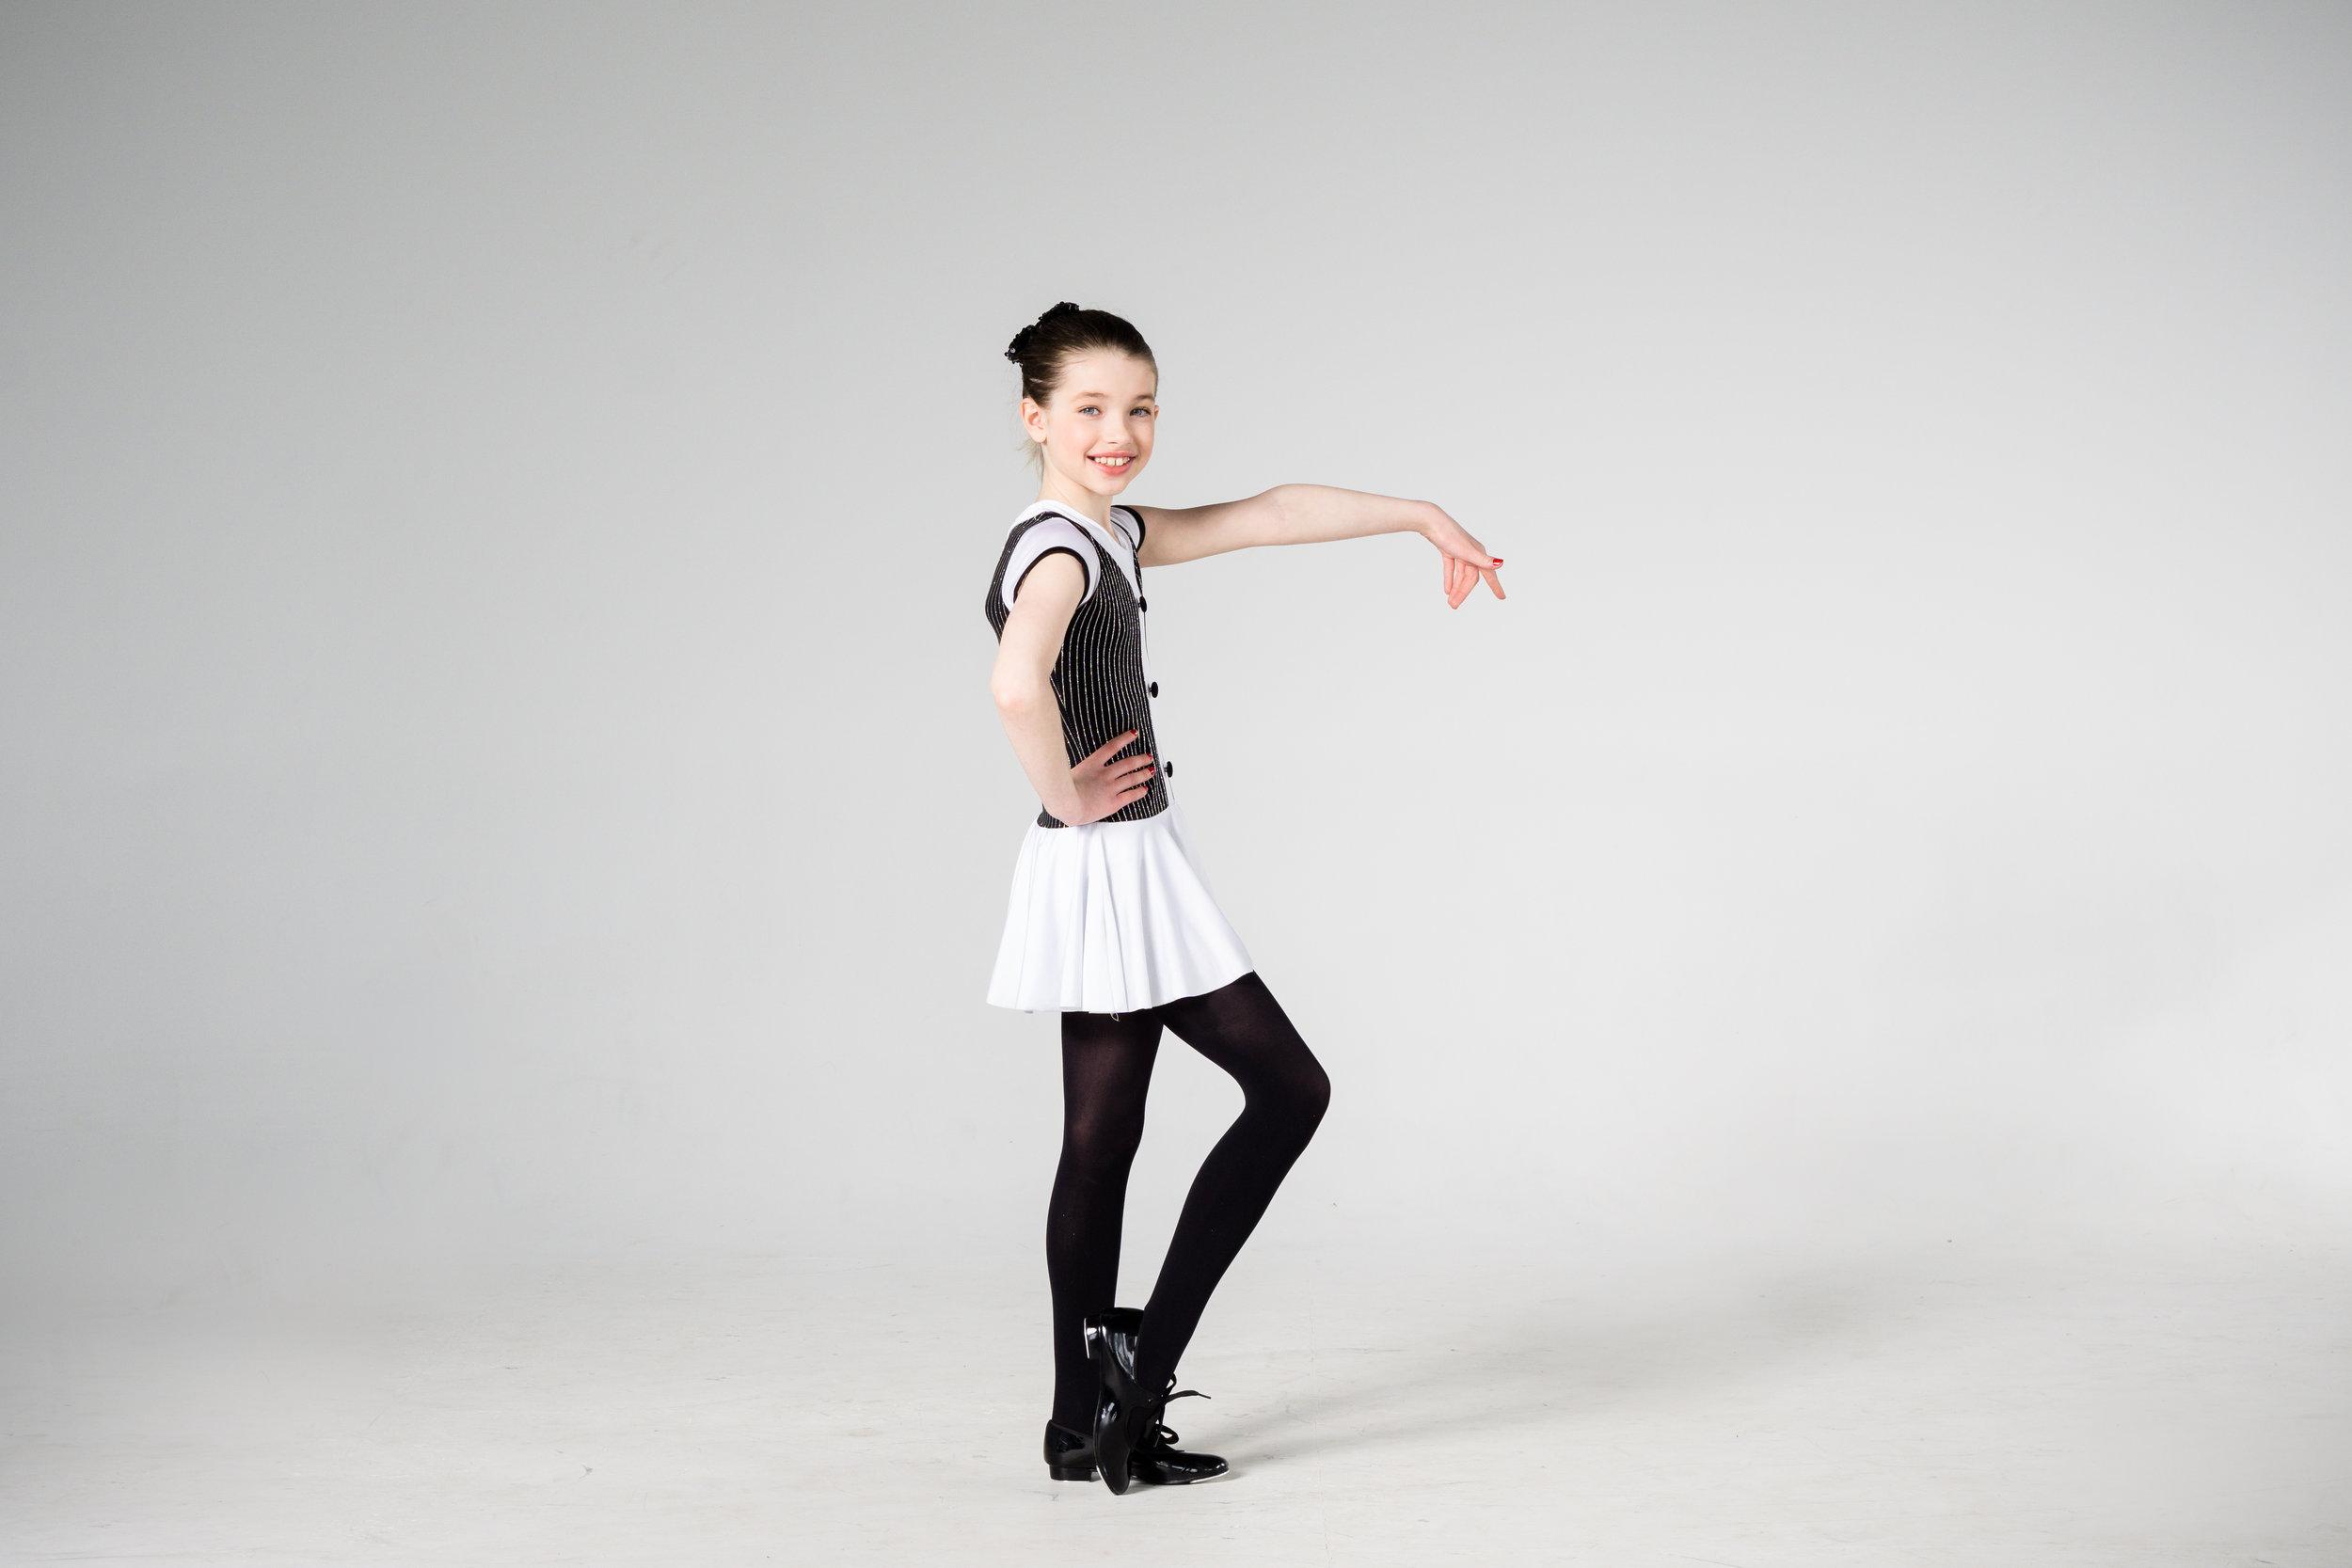 young tap dancer posing